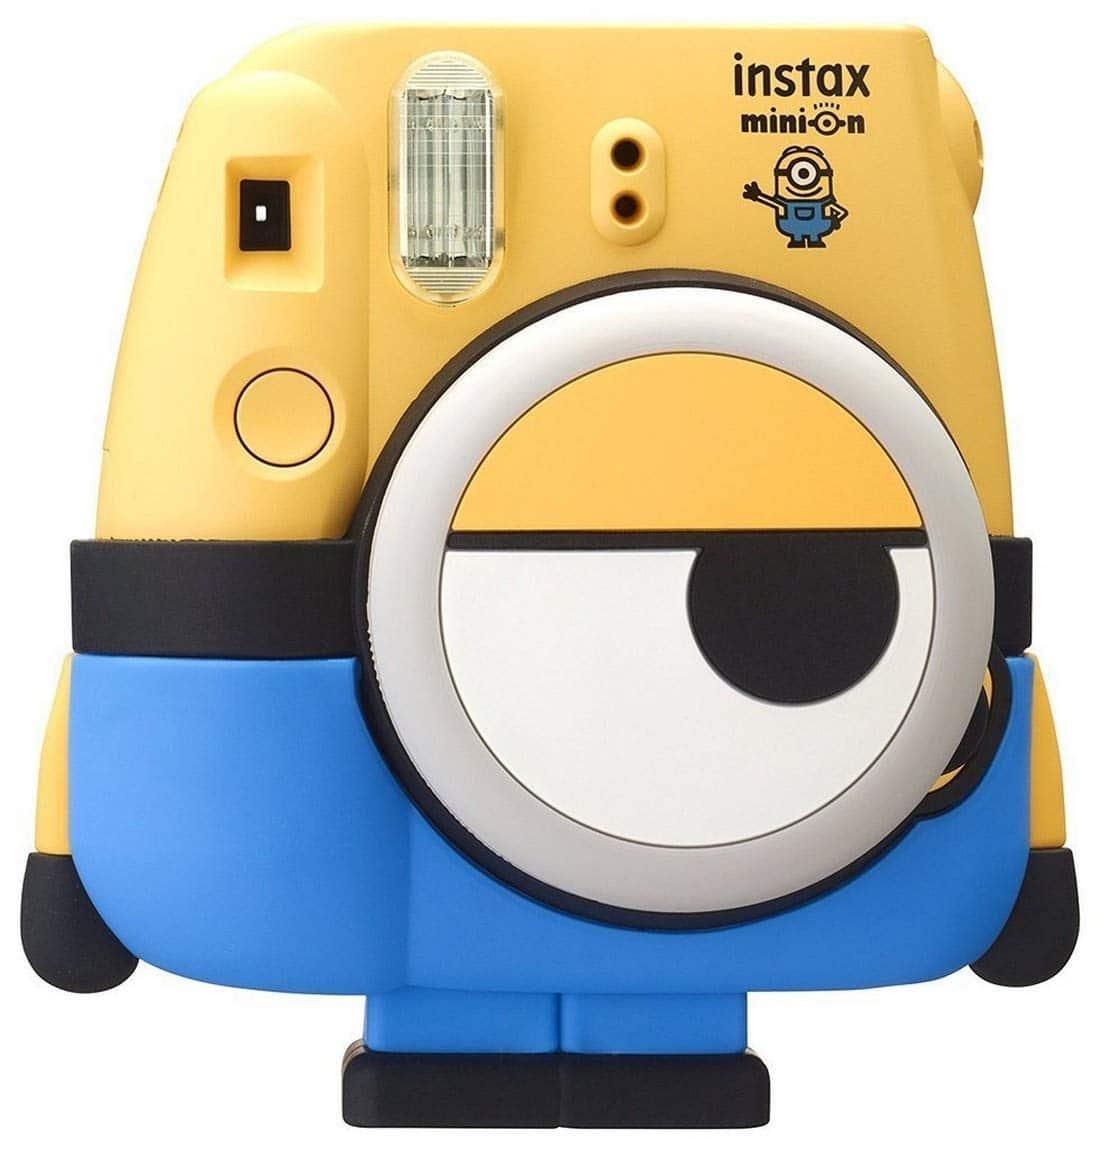 ppareil photo instantané Fujifilm Instax Mini 8 Minion gadget insolite